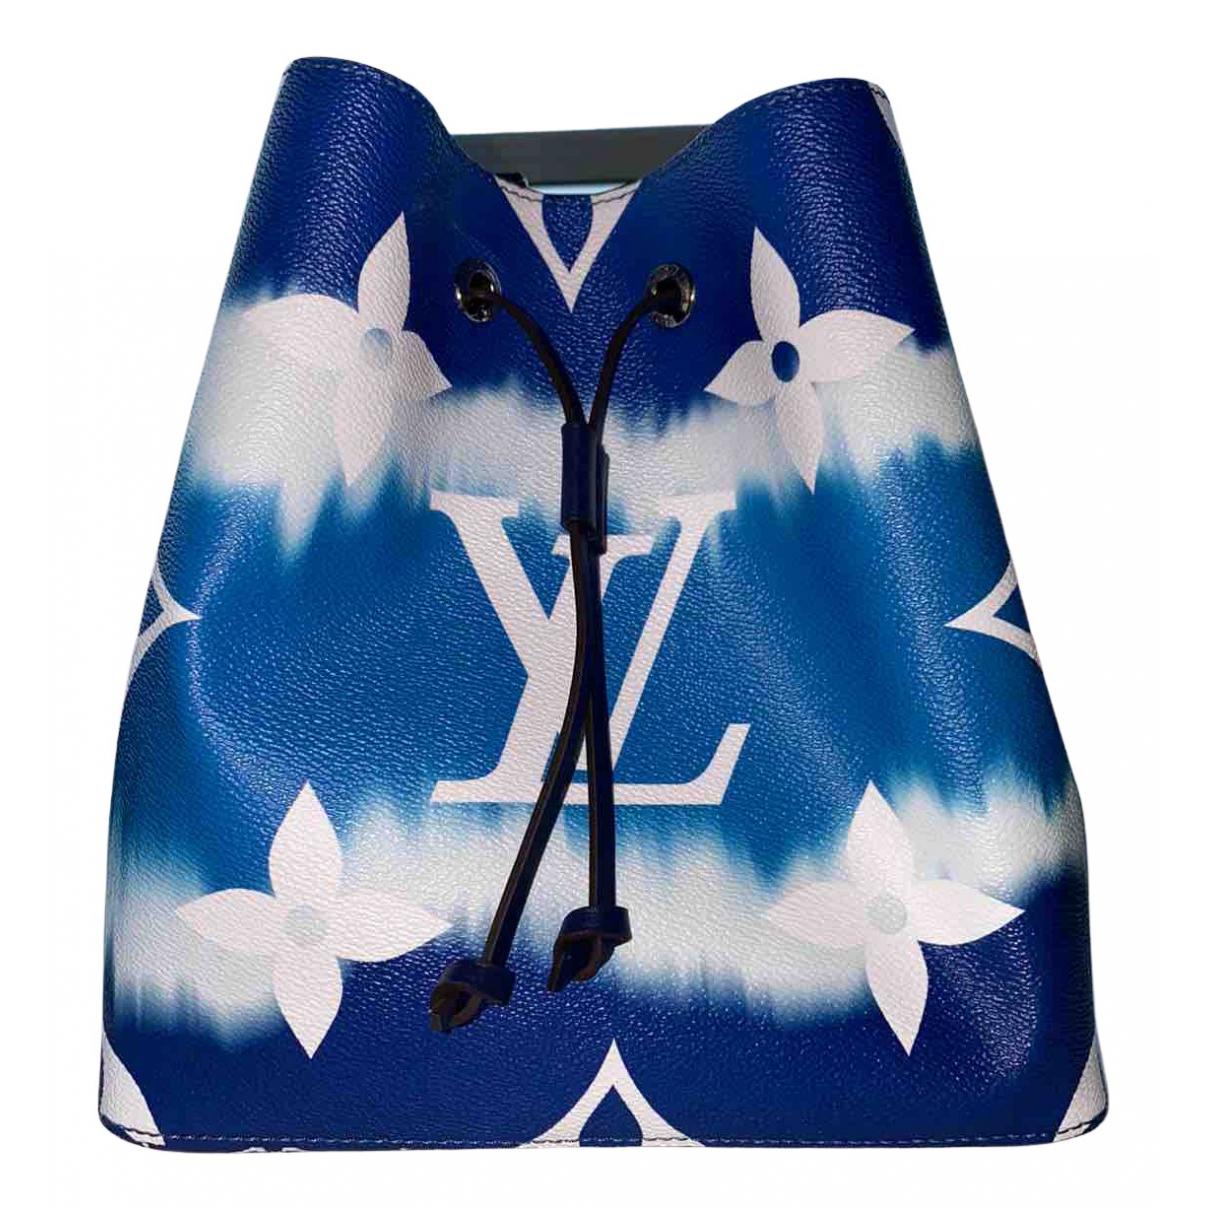 Louis Vuitton - Sac a main NeoNoe pour femme en toile - bleu